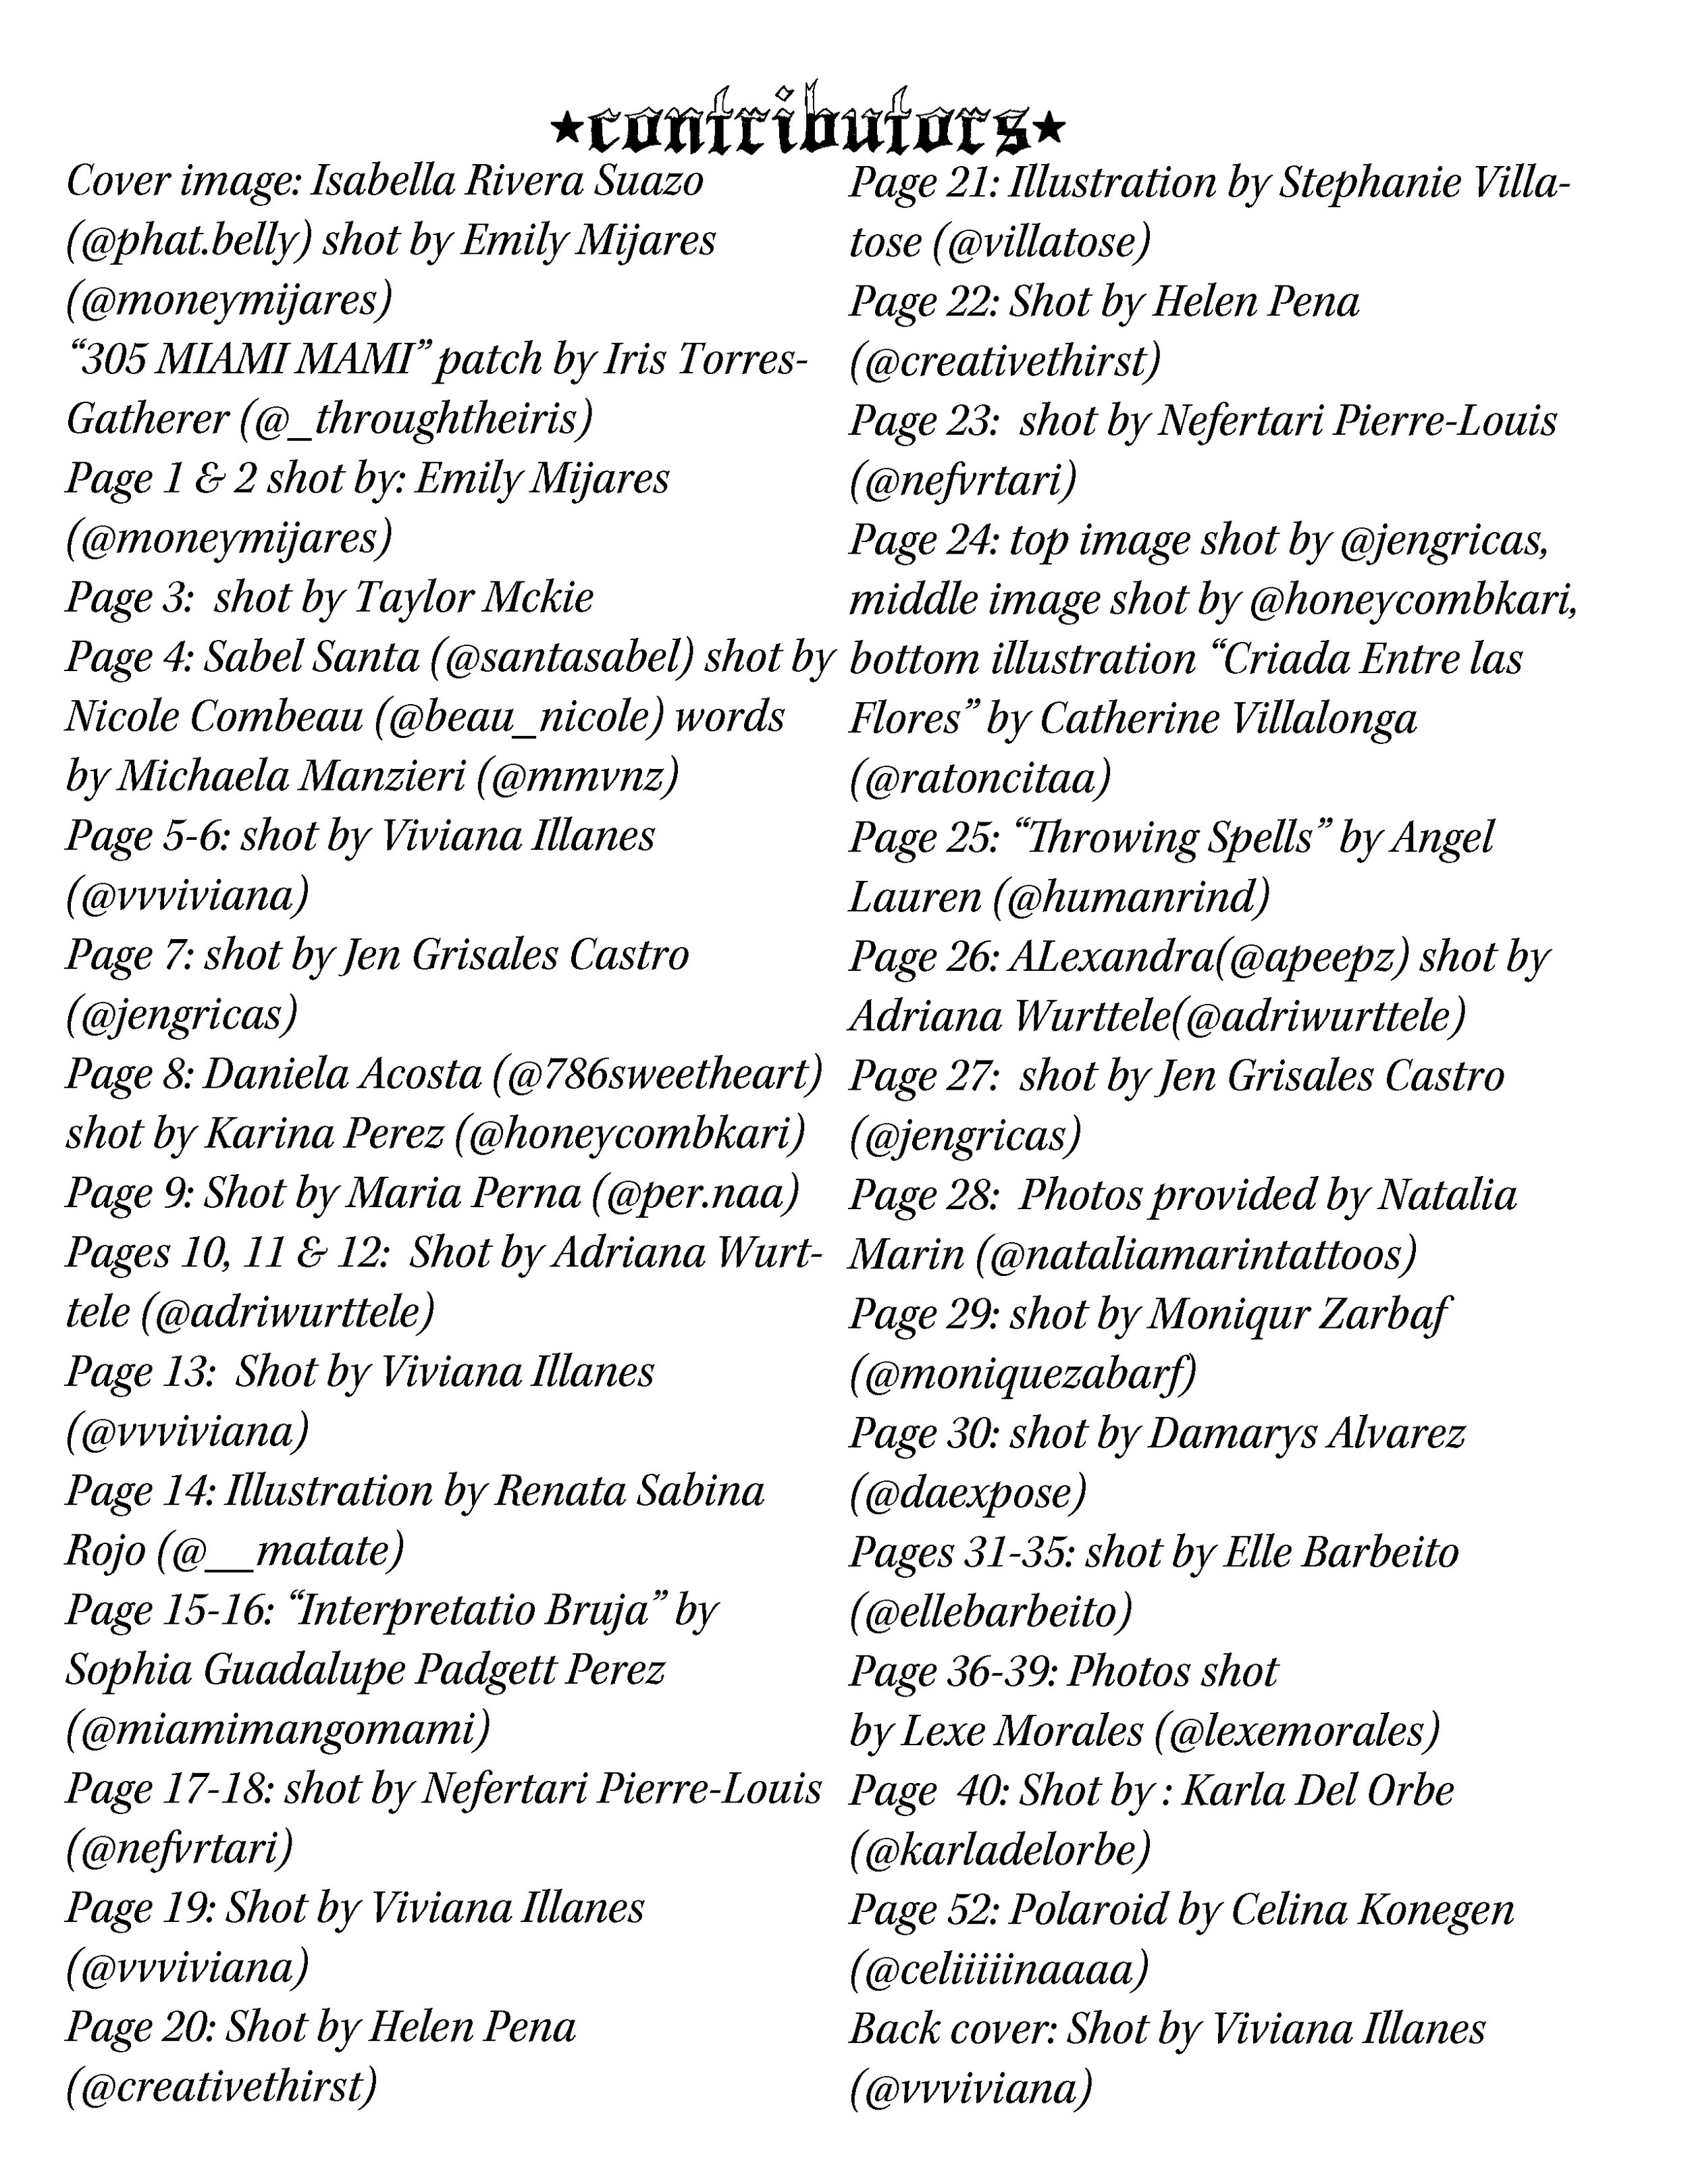 57- PAGE 54 CREDITS.jpg